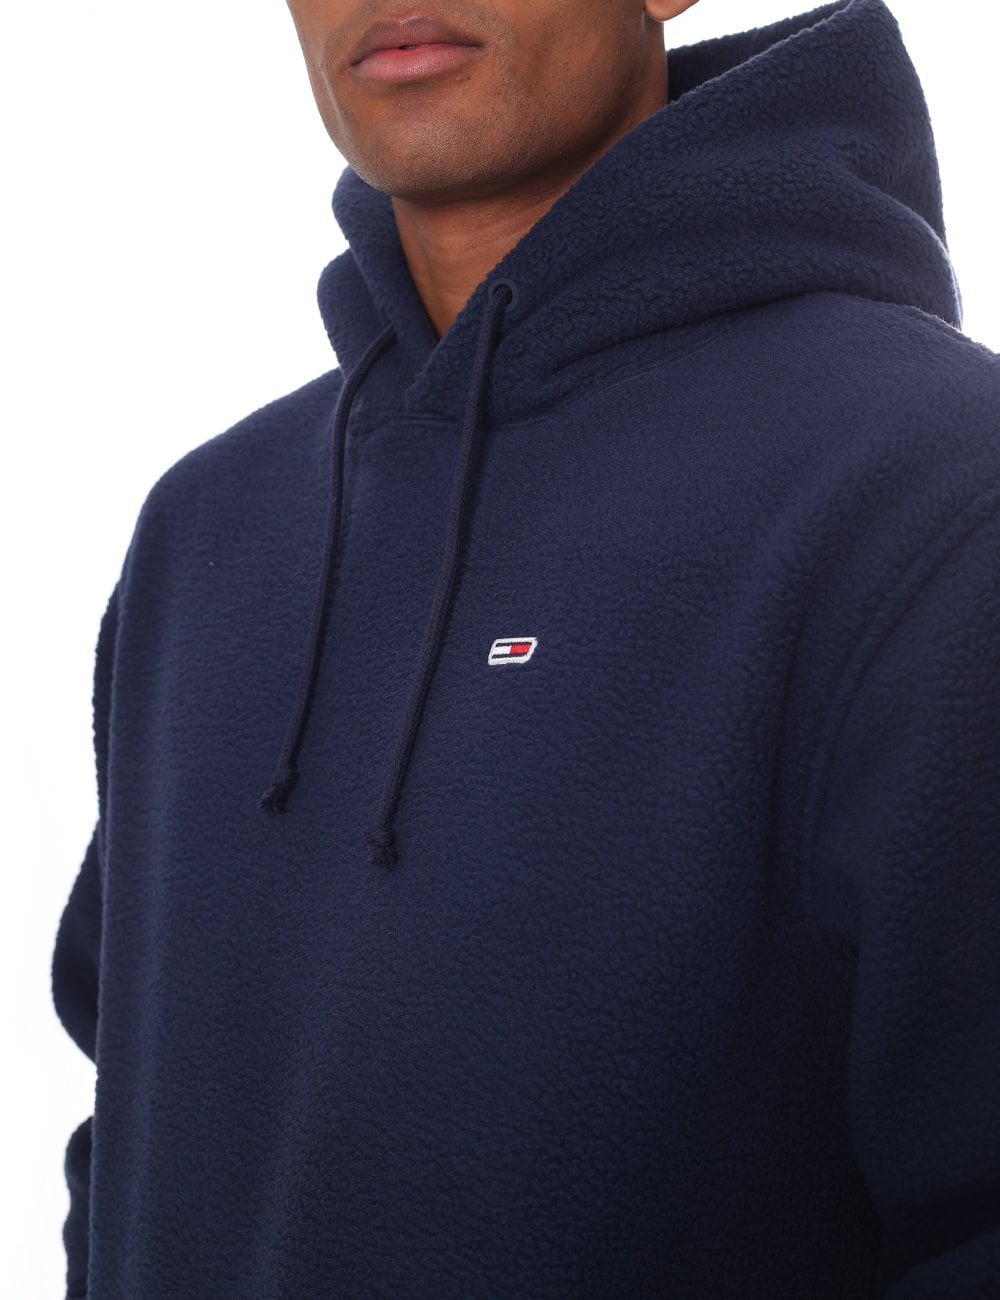 Tommy Hilfiger Men s Classics Polar Hooded Fleece 7b68a3a70d2e